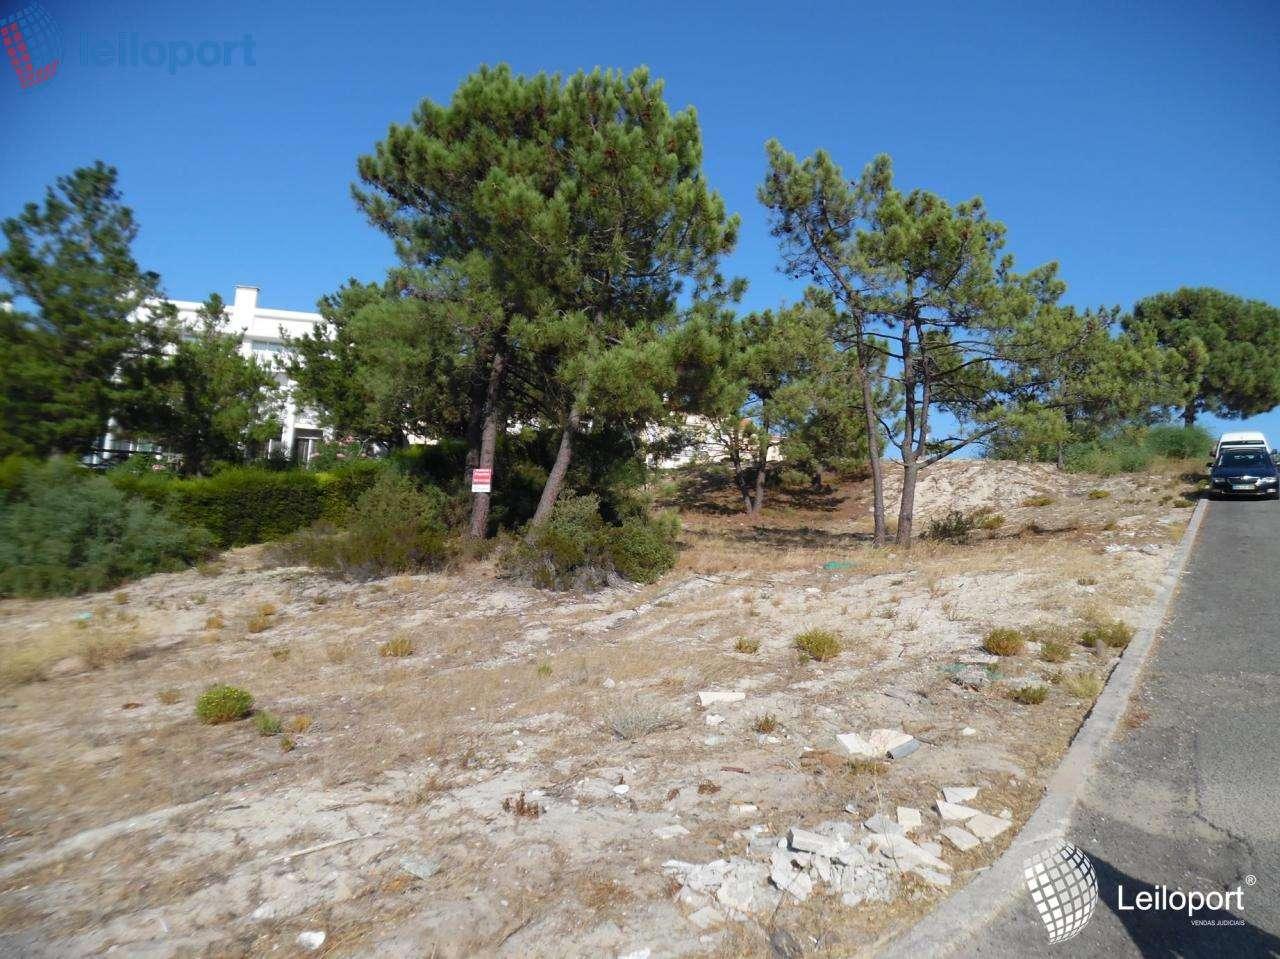 Terreno para comprar, Carvalhal, Setúbal - Foto 3